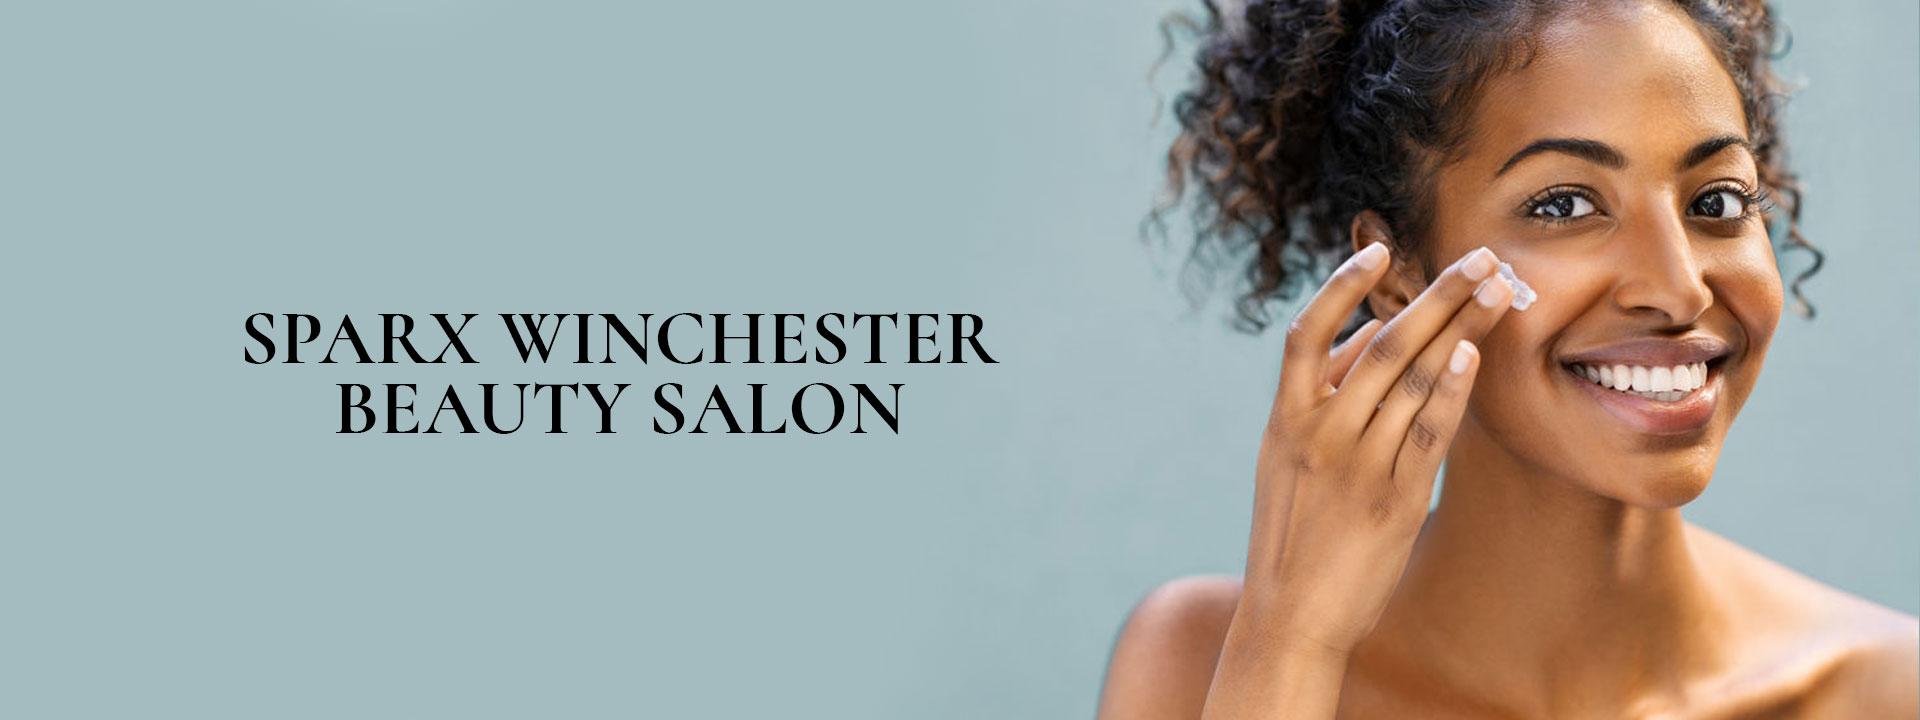 Sparx Winchester Beauty Salon